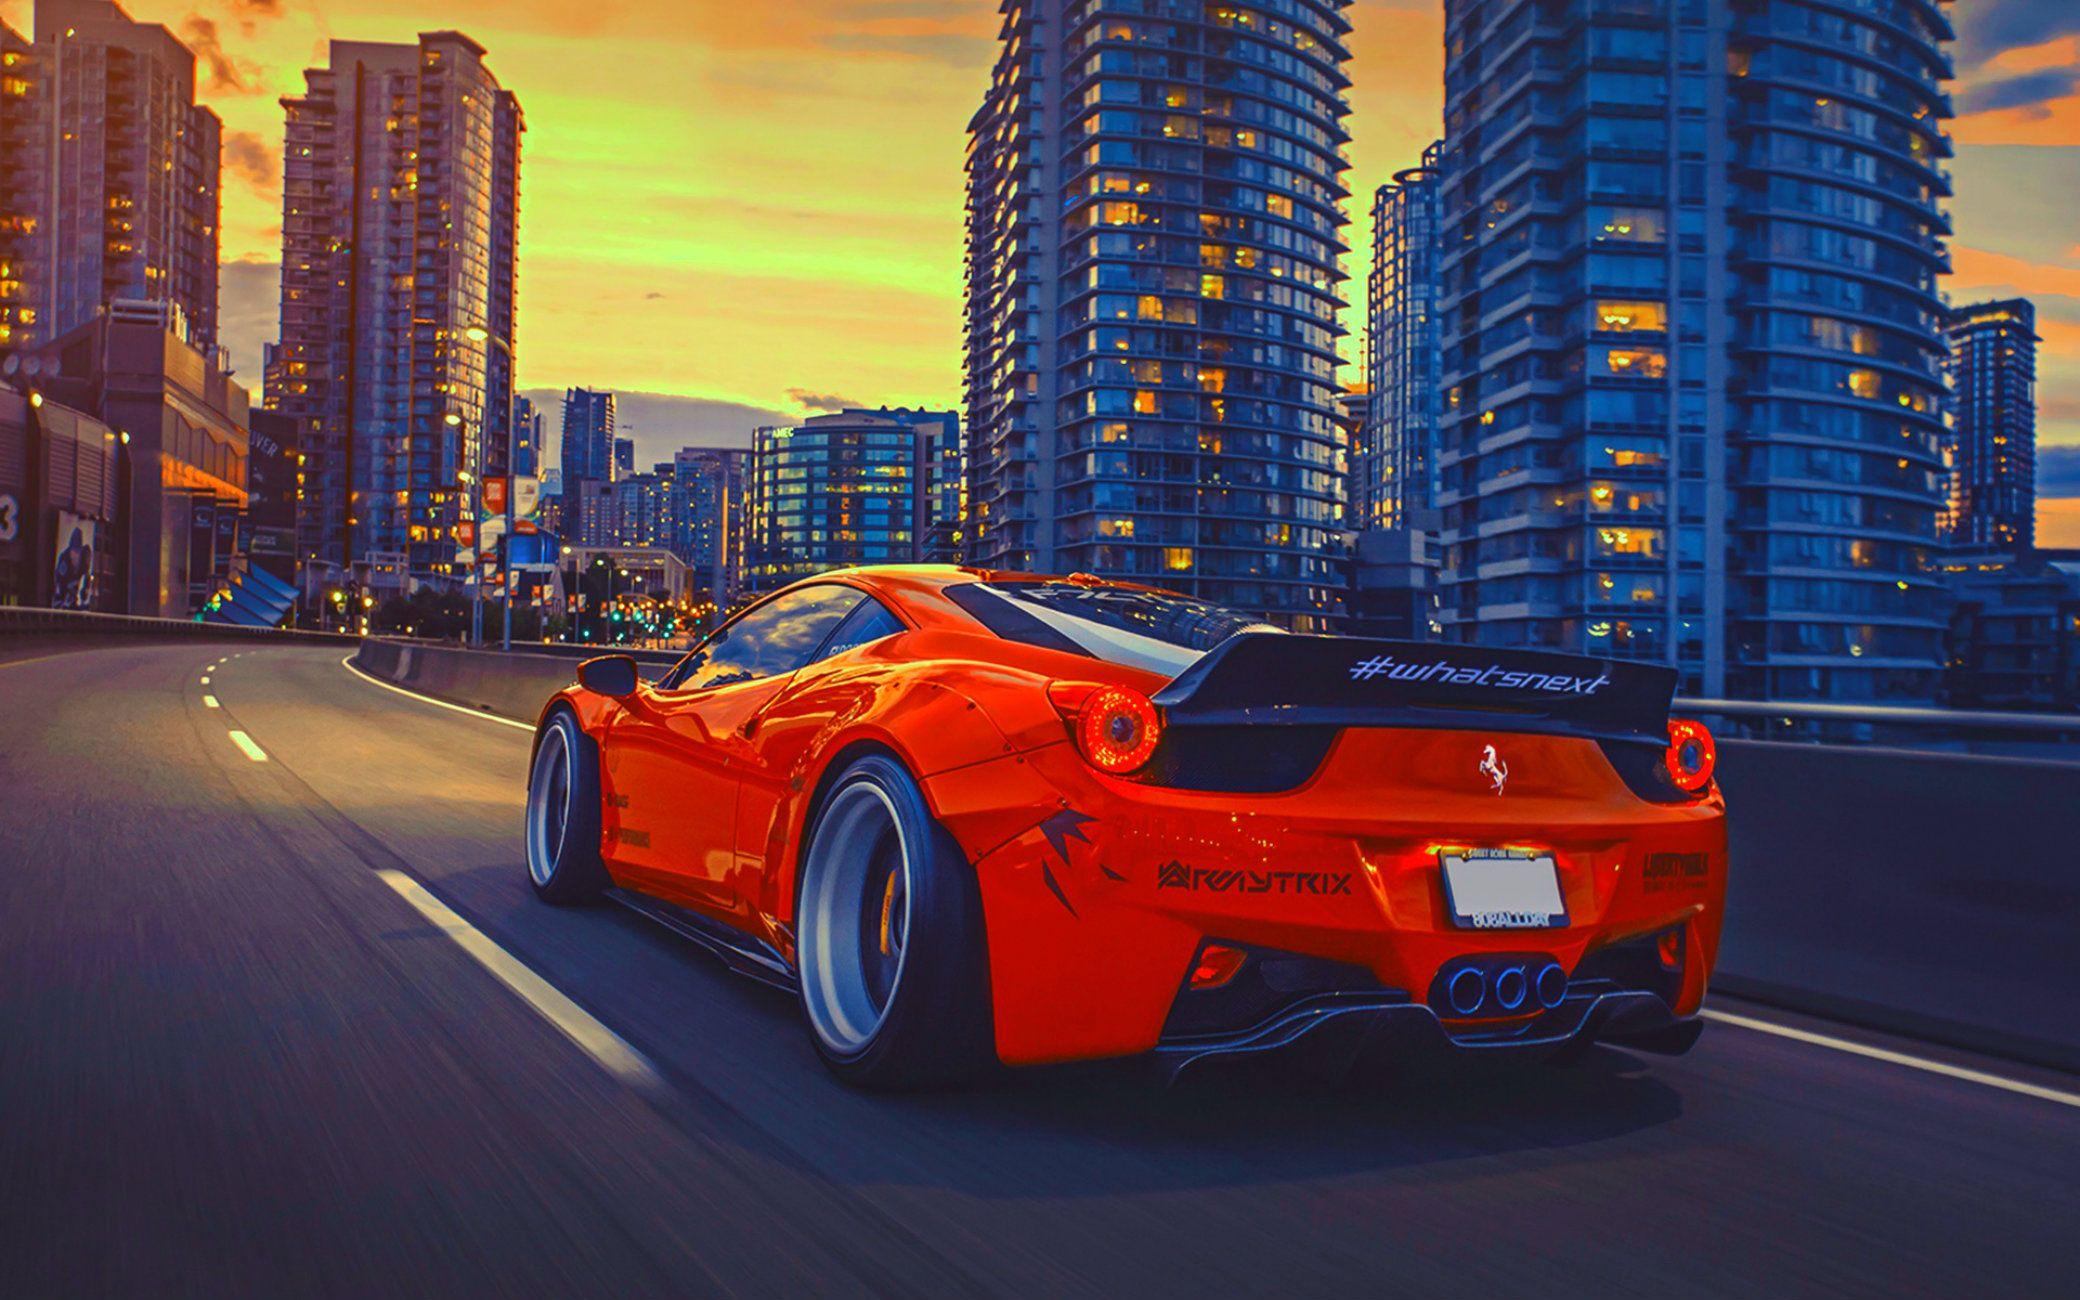 Wallpaper Hd Ferrari